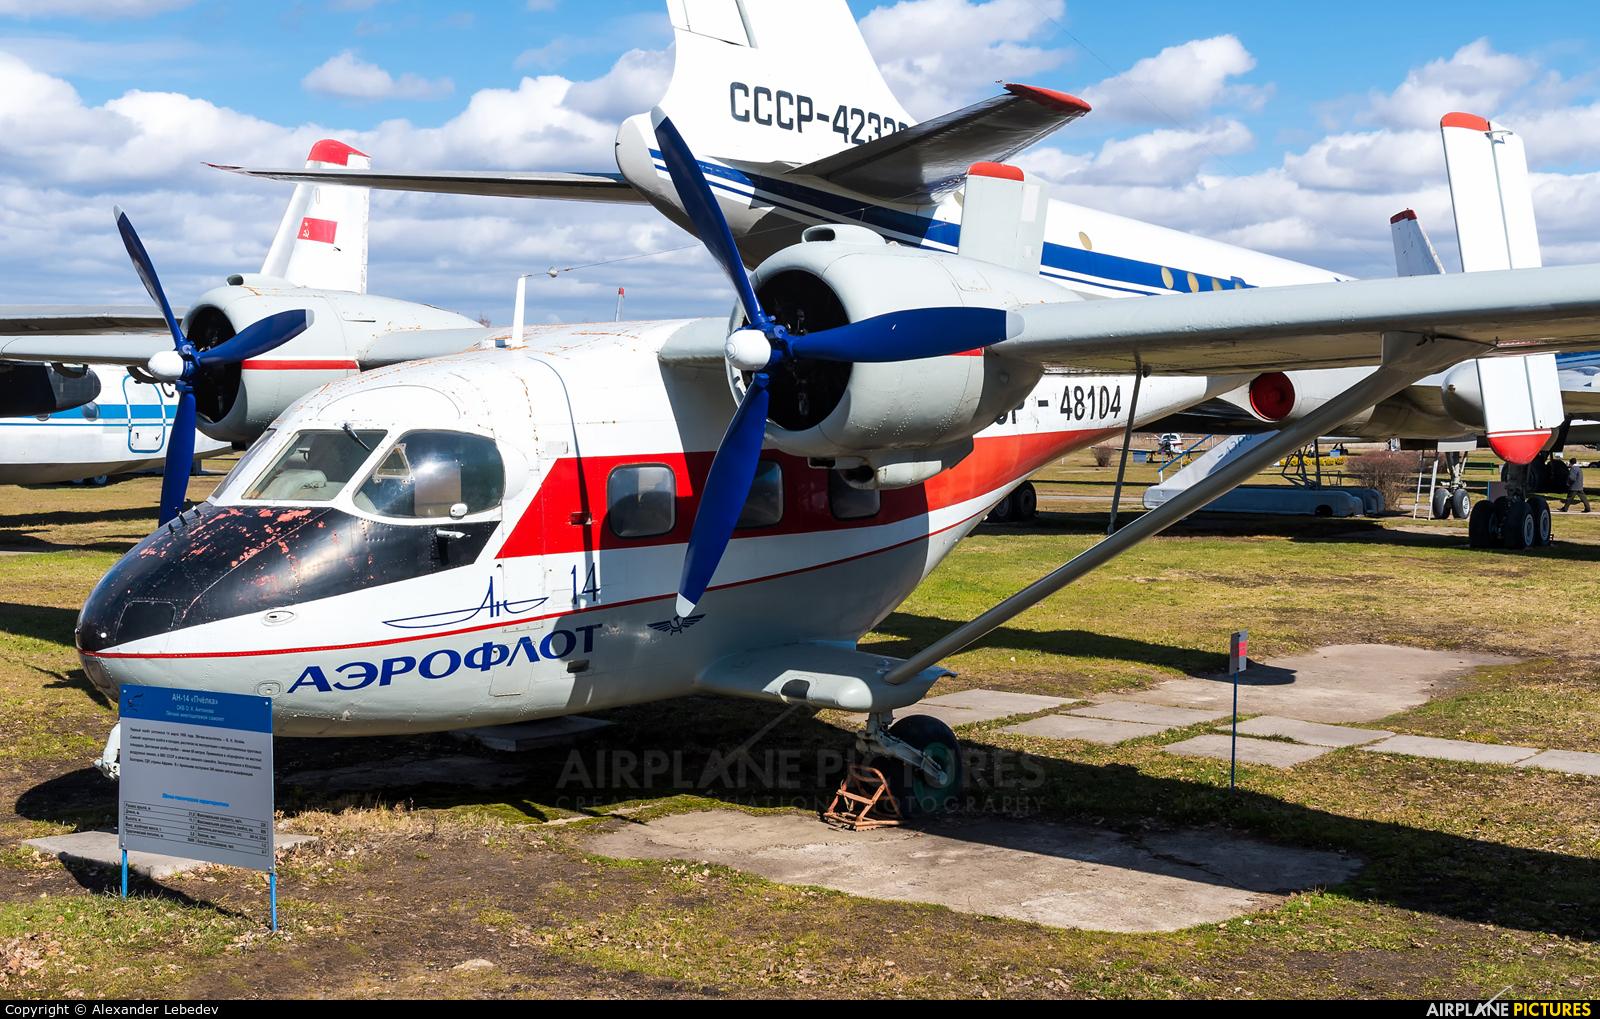 Aeroflot CCCP-48104 aircraft at Ulyanovsk - Baratayevka